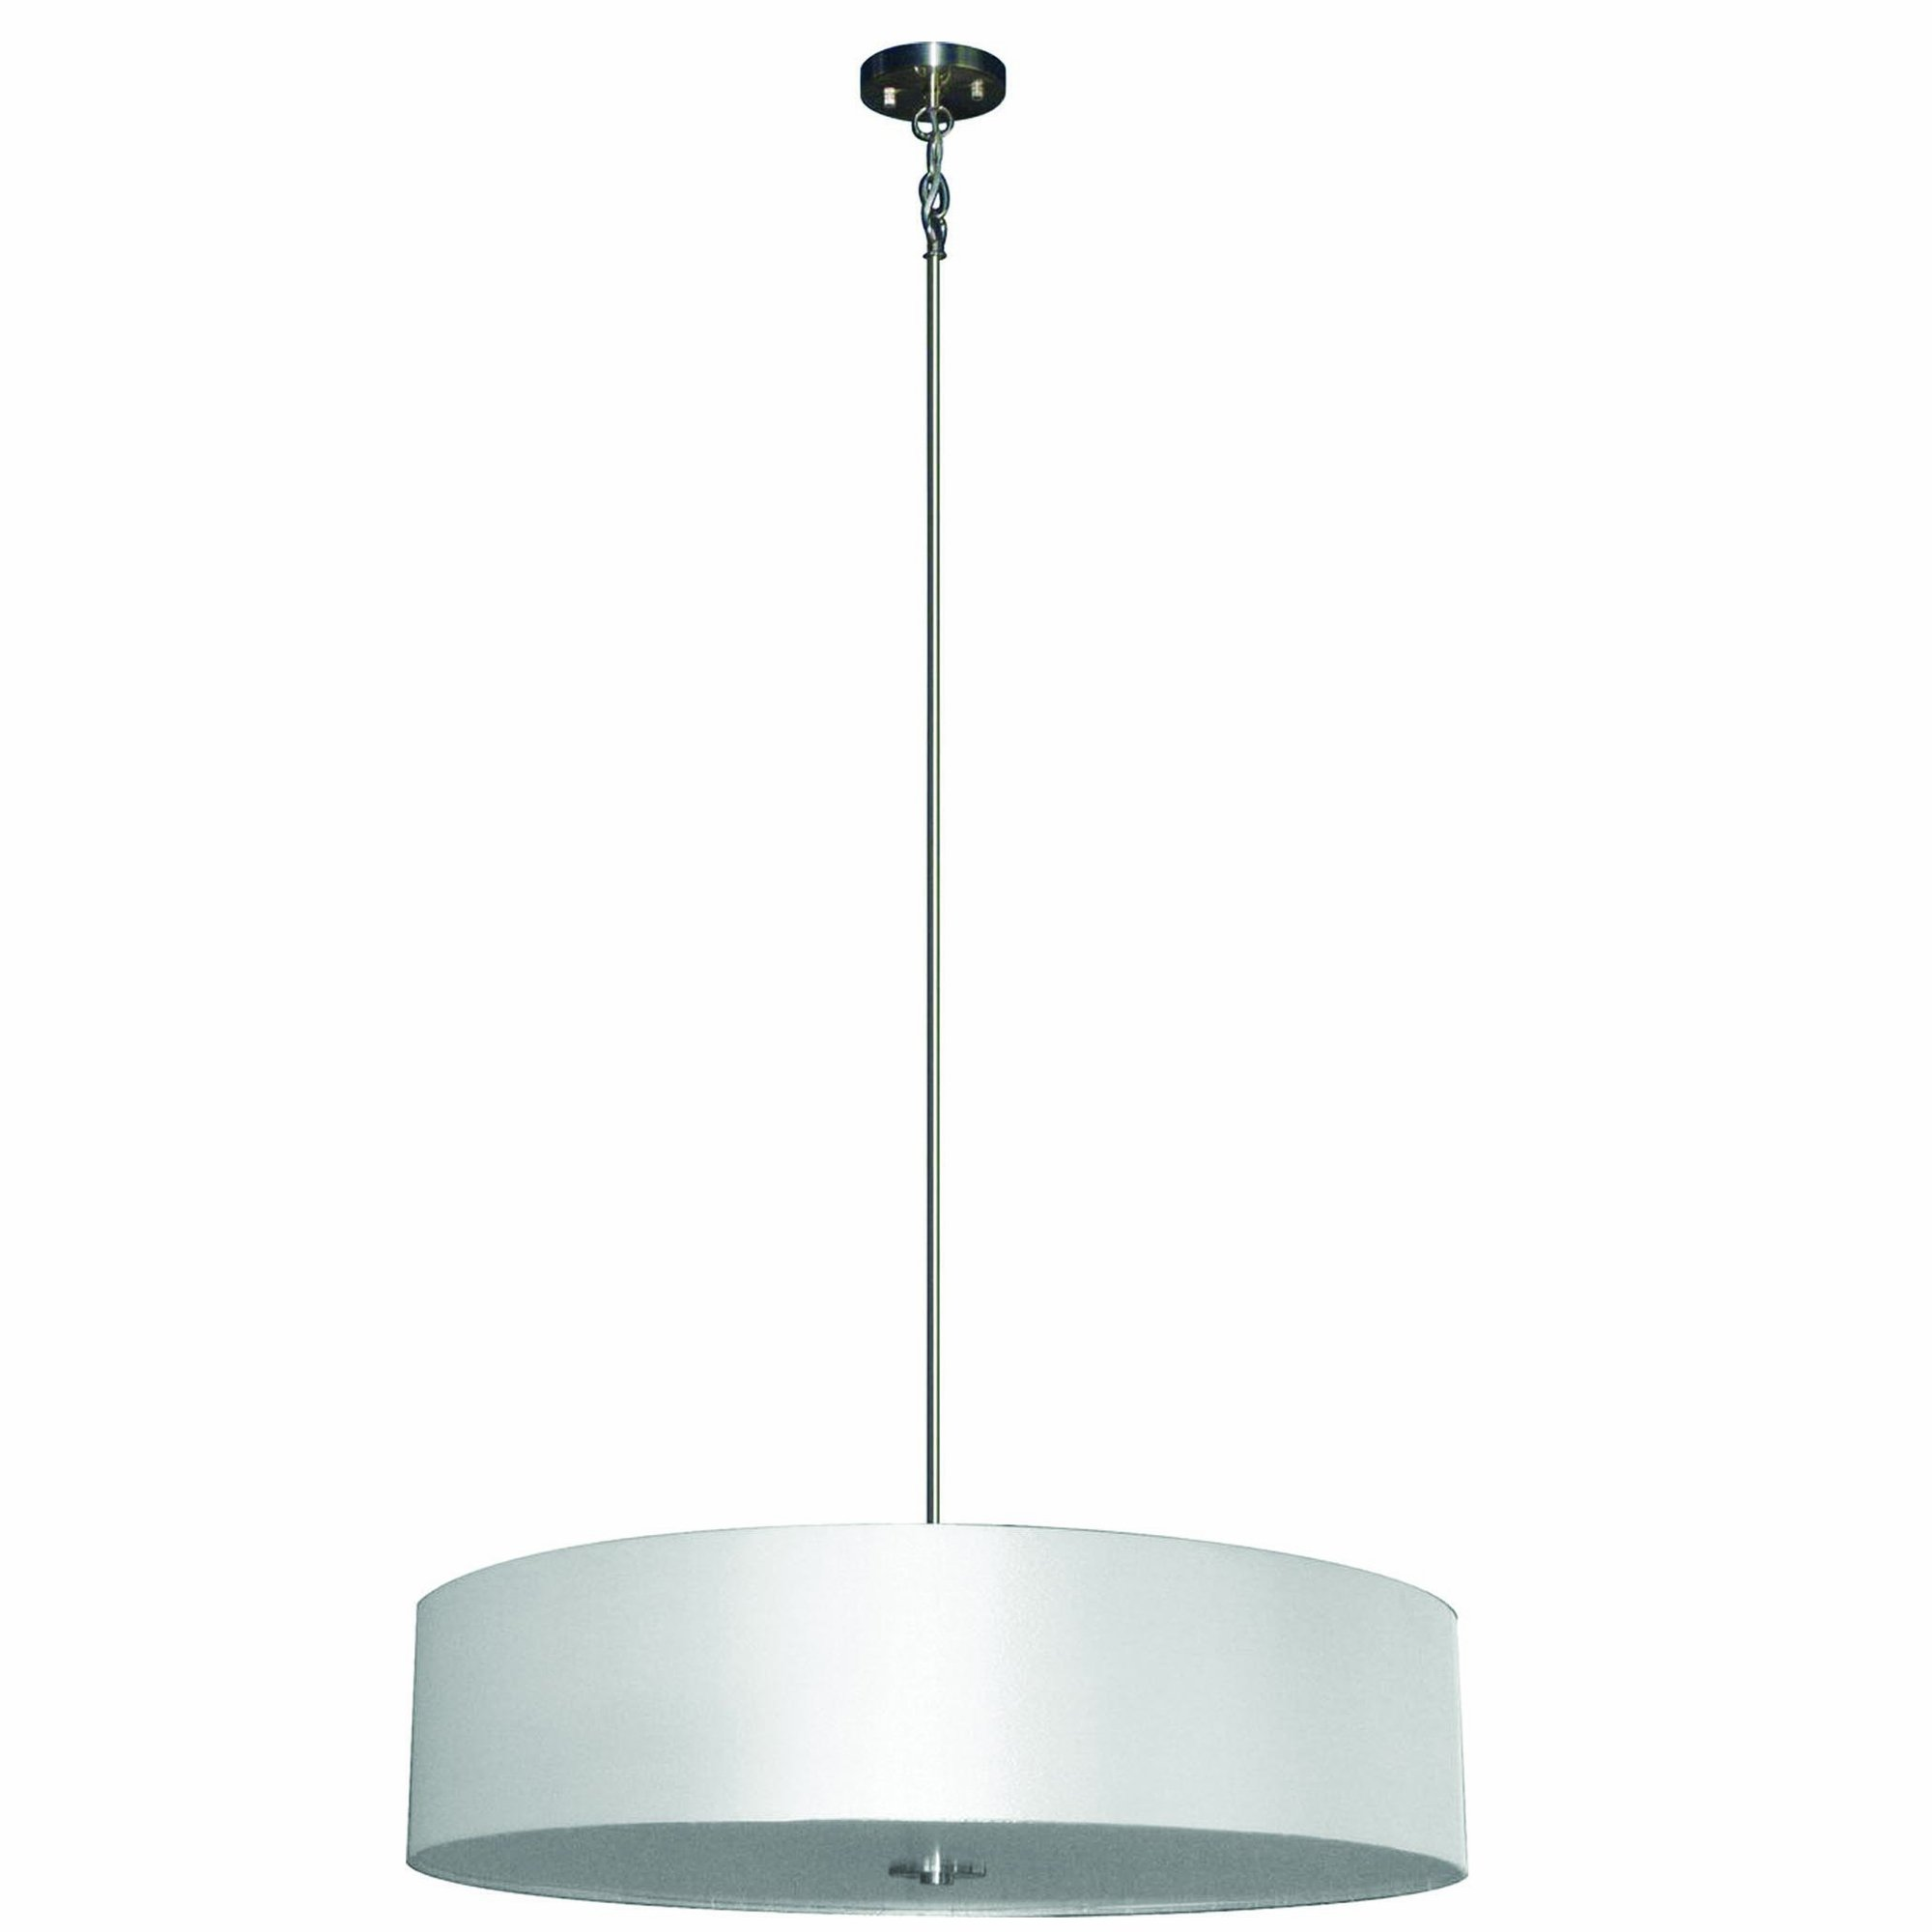 Yosemite Home Decor SH3007-5P-PWSS 5-Lights Pendant with Pristine White Shade, Satin Steel